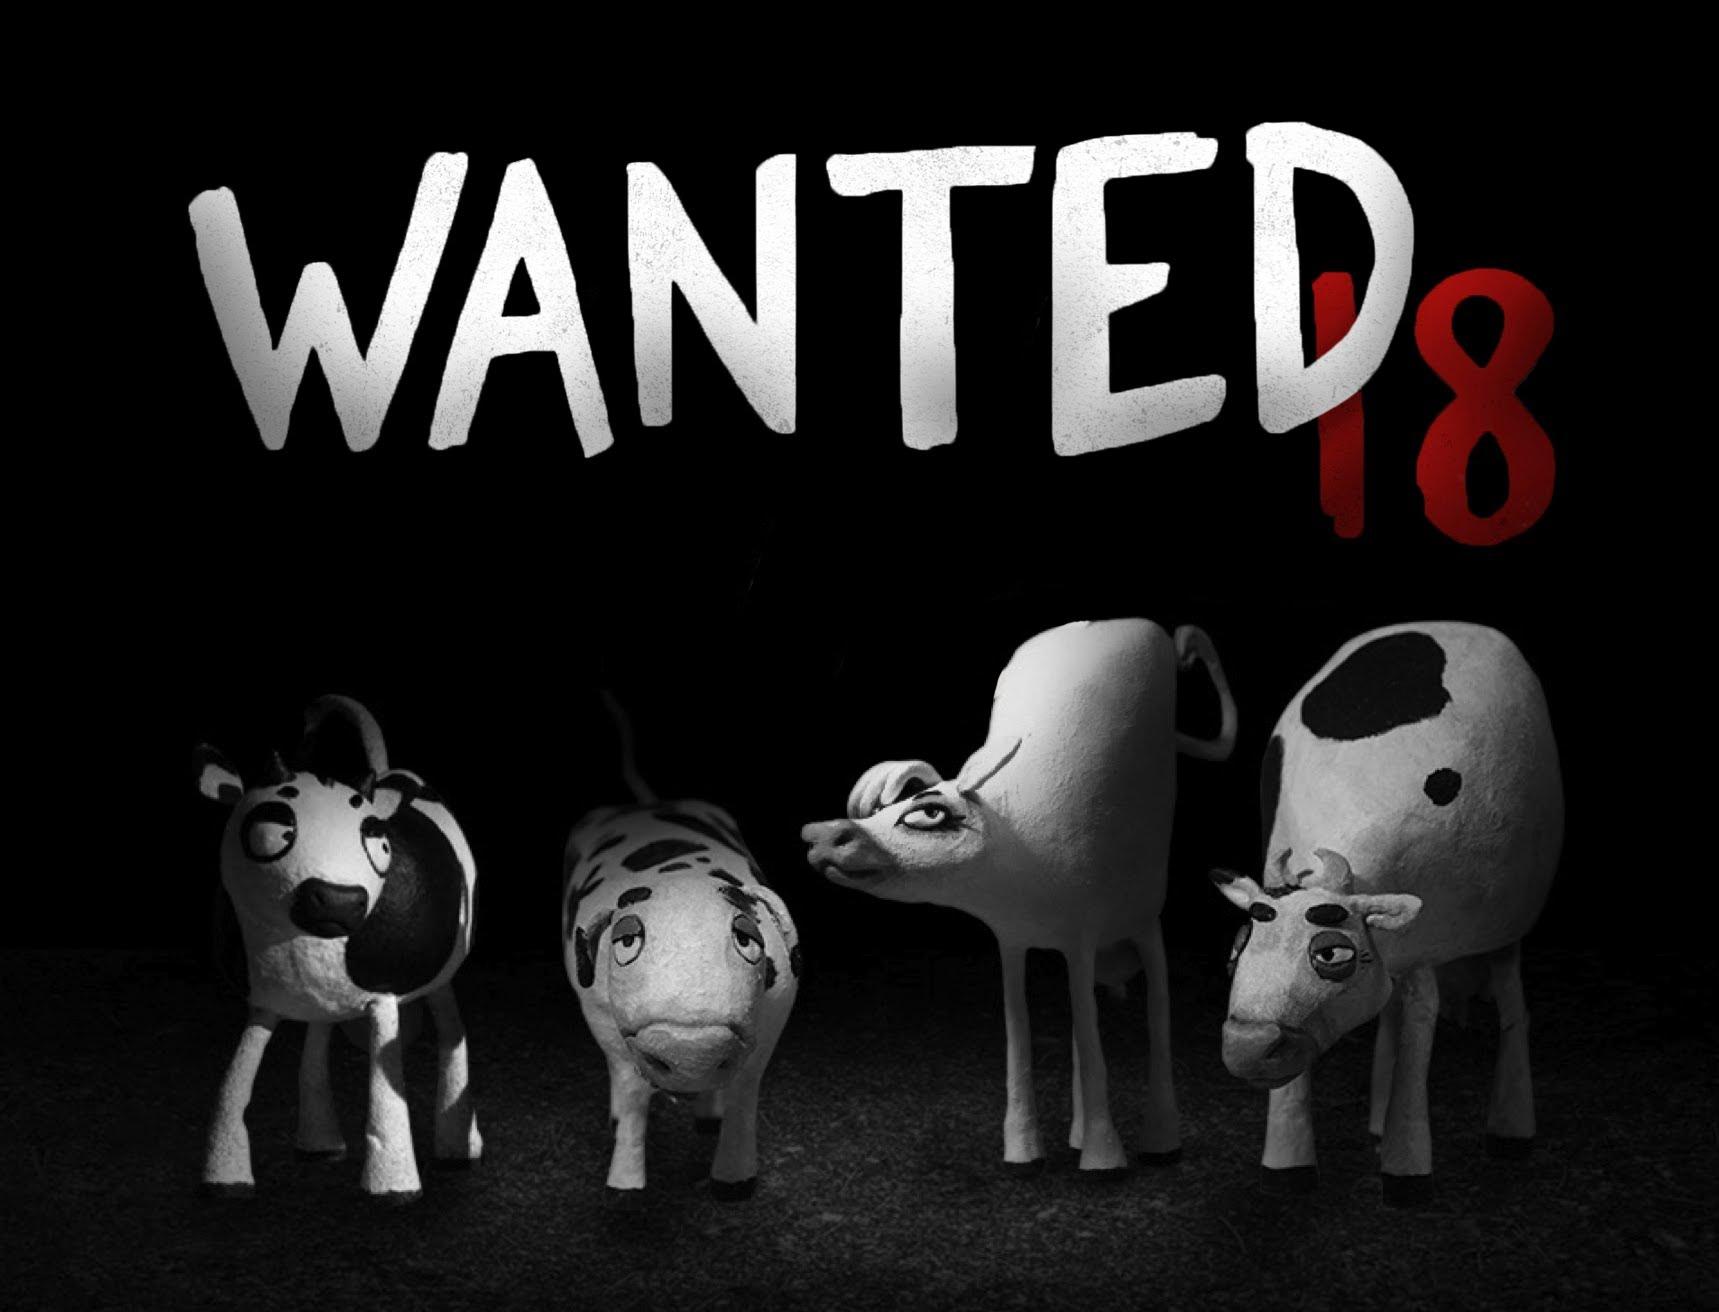 Wanted18.com